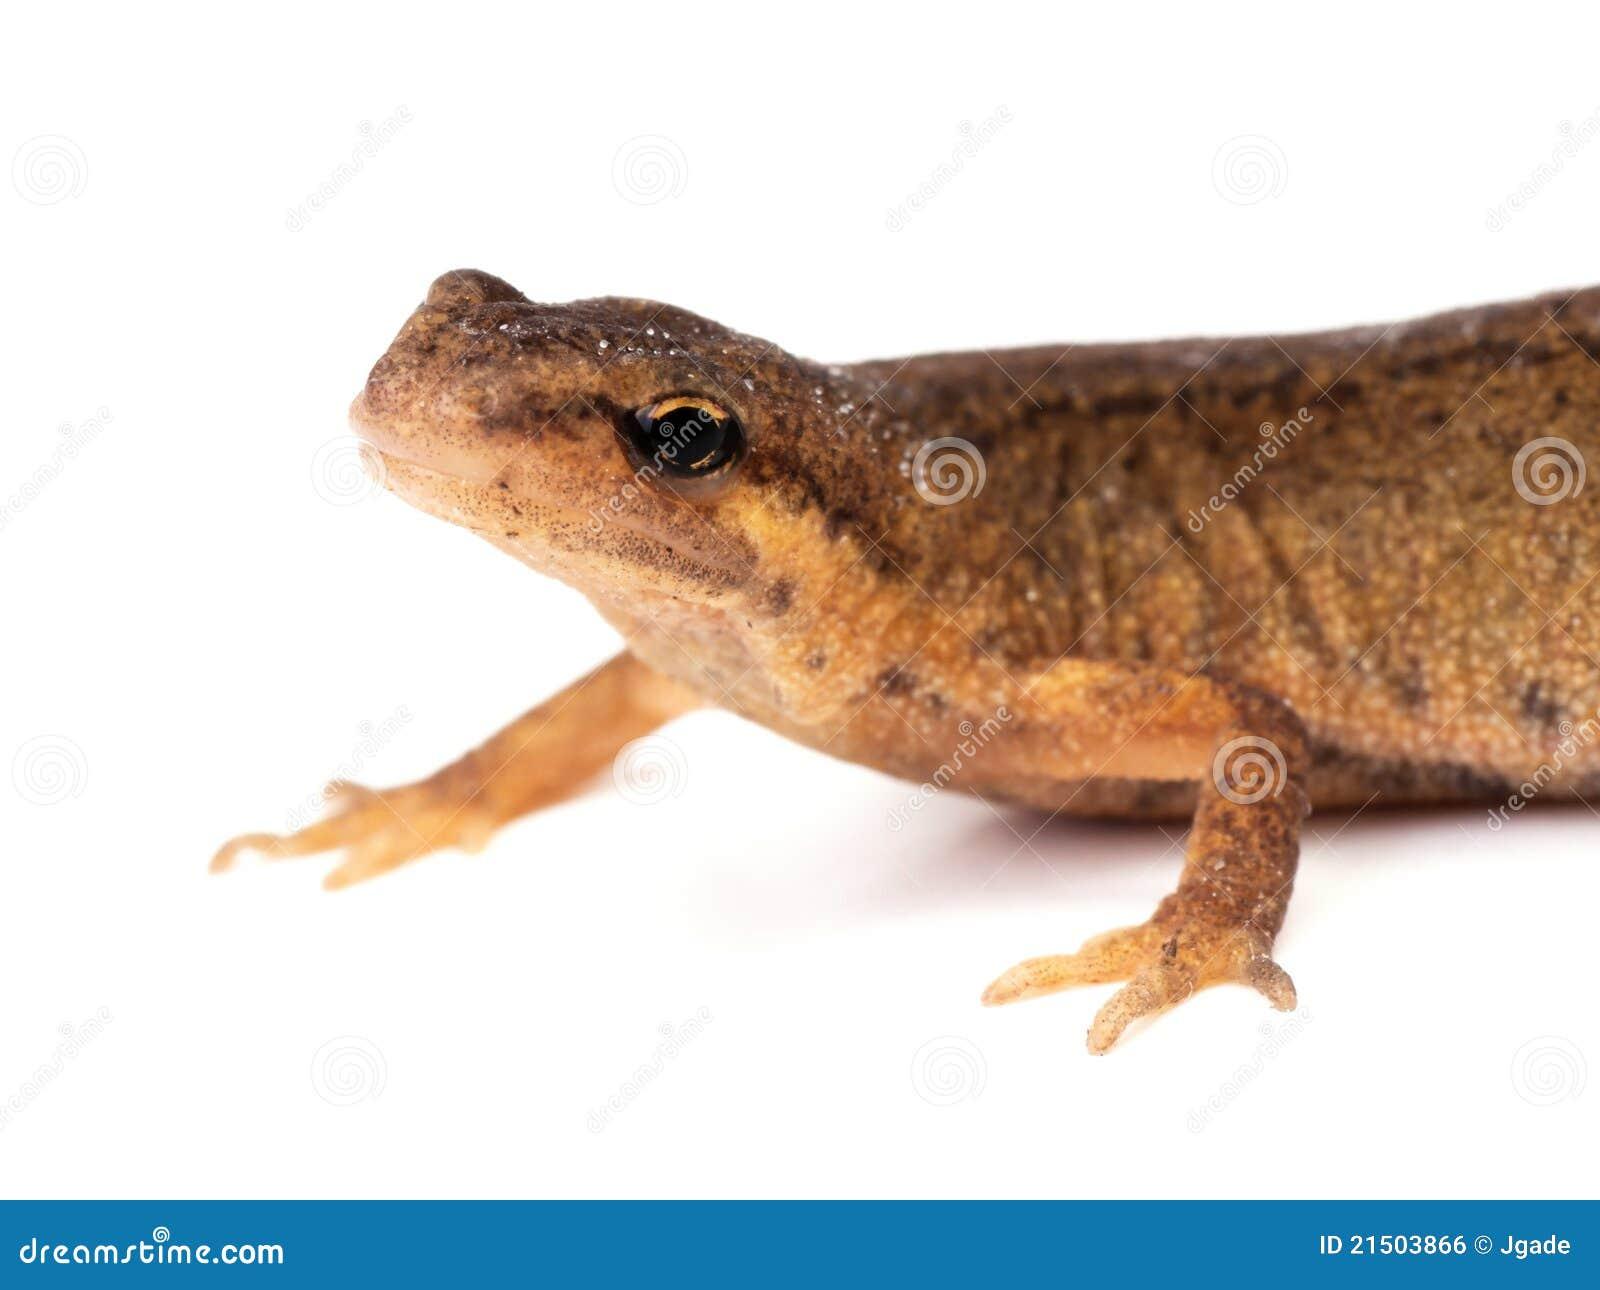 salamander white background - photo #24